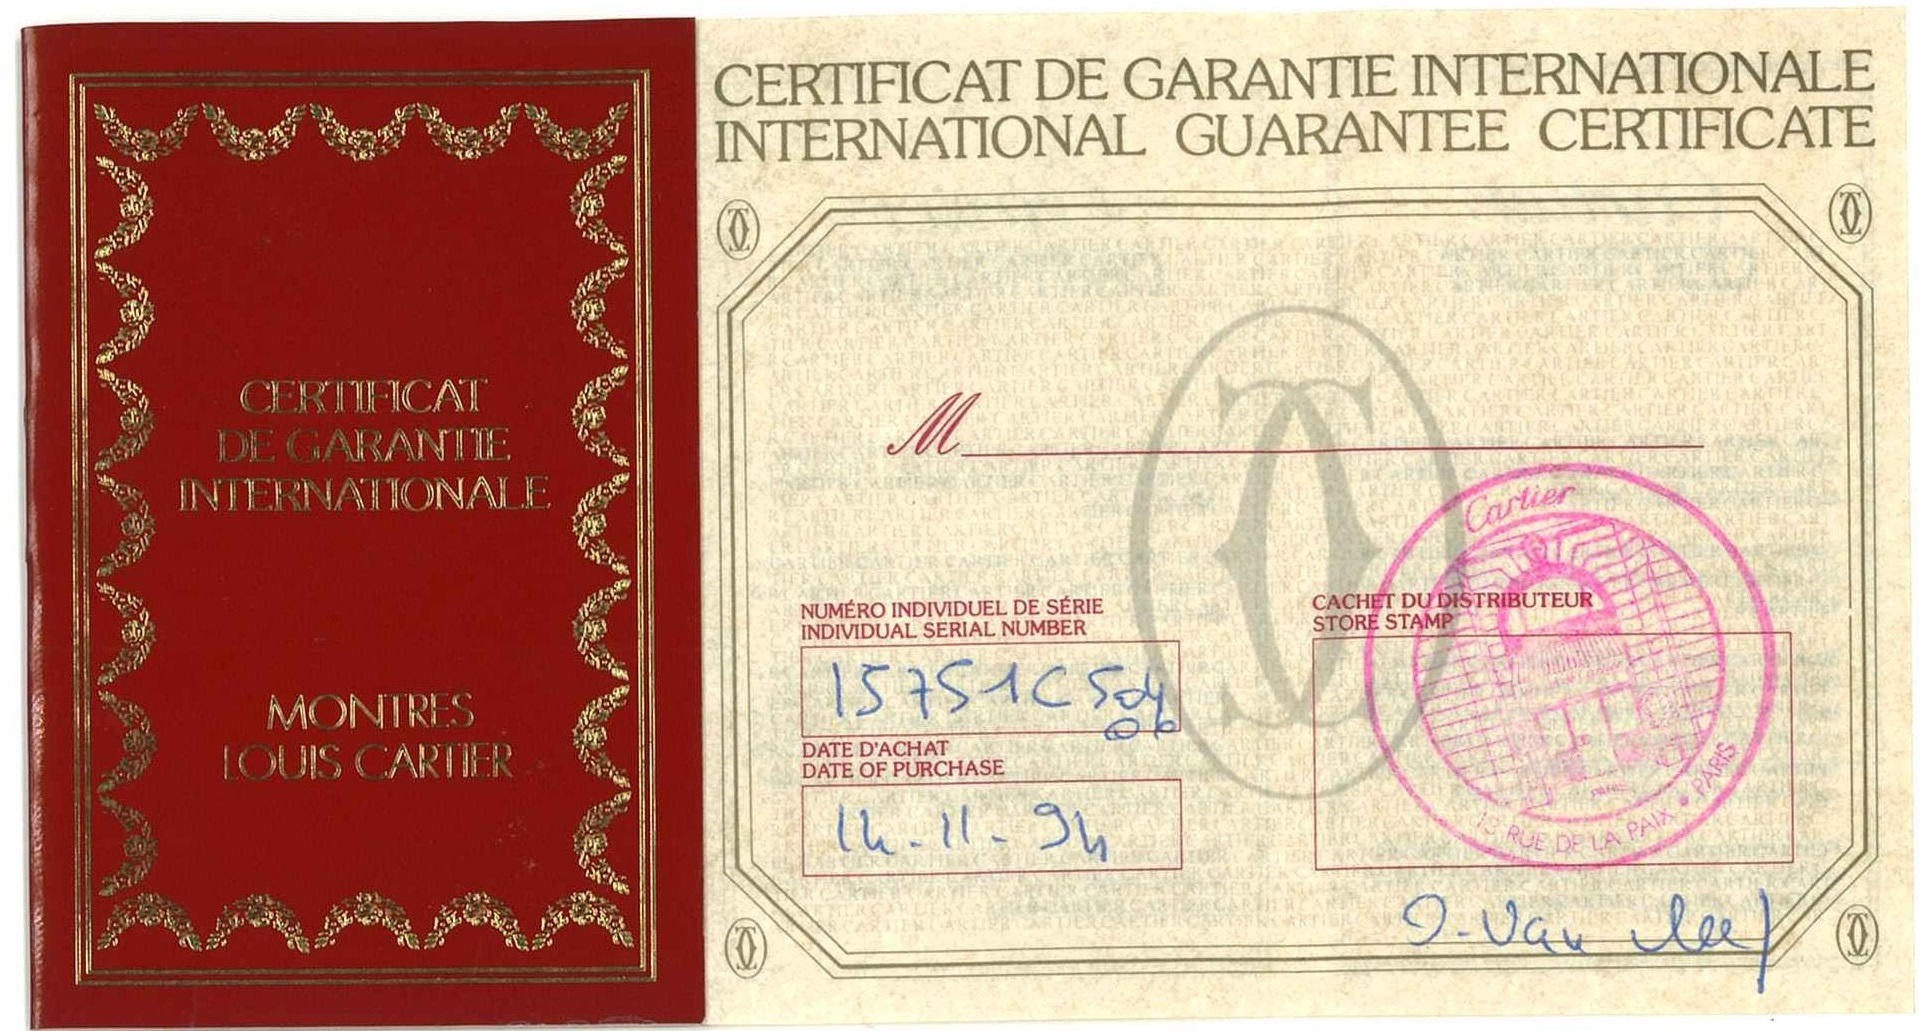 CARTIER, PLATINUM SANTOS DUMONT 90TH ANNIVERSARY, REF. 1575 1